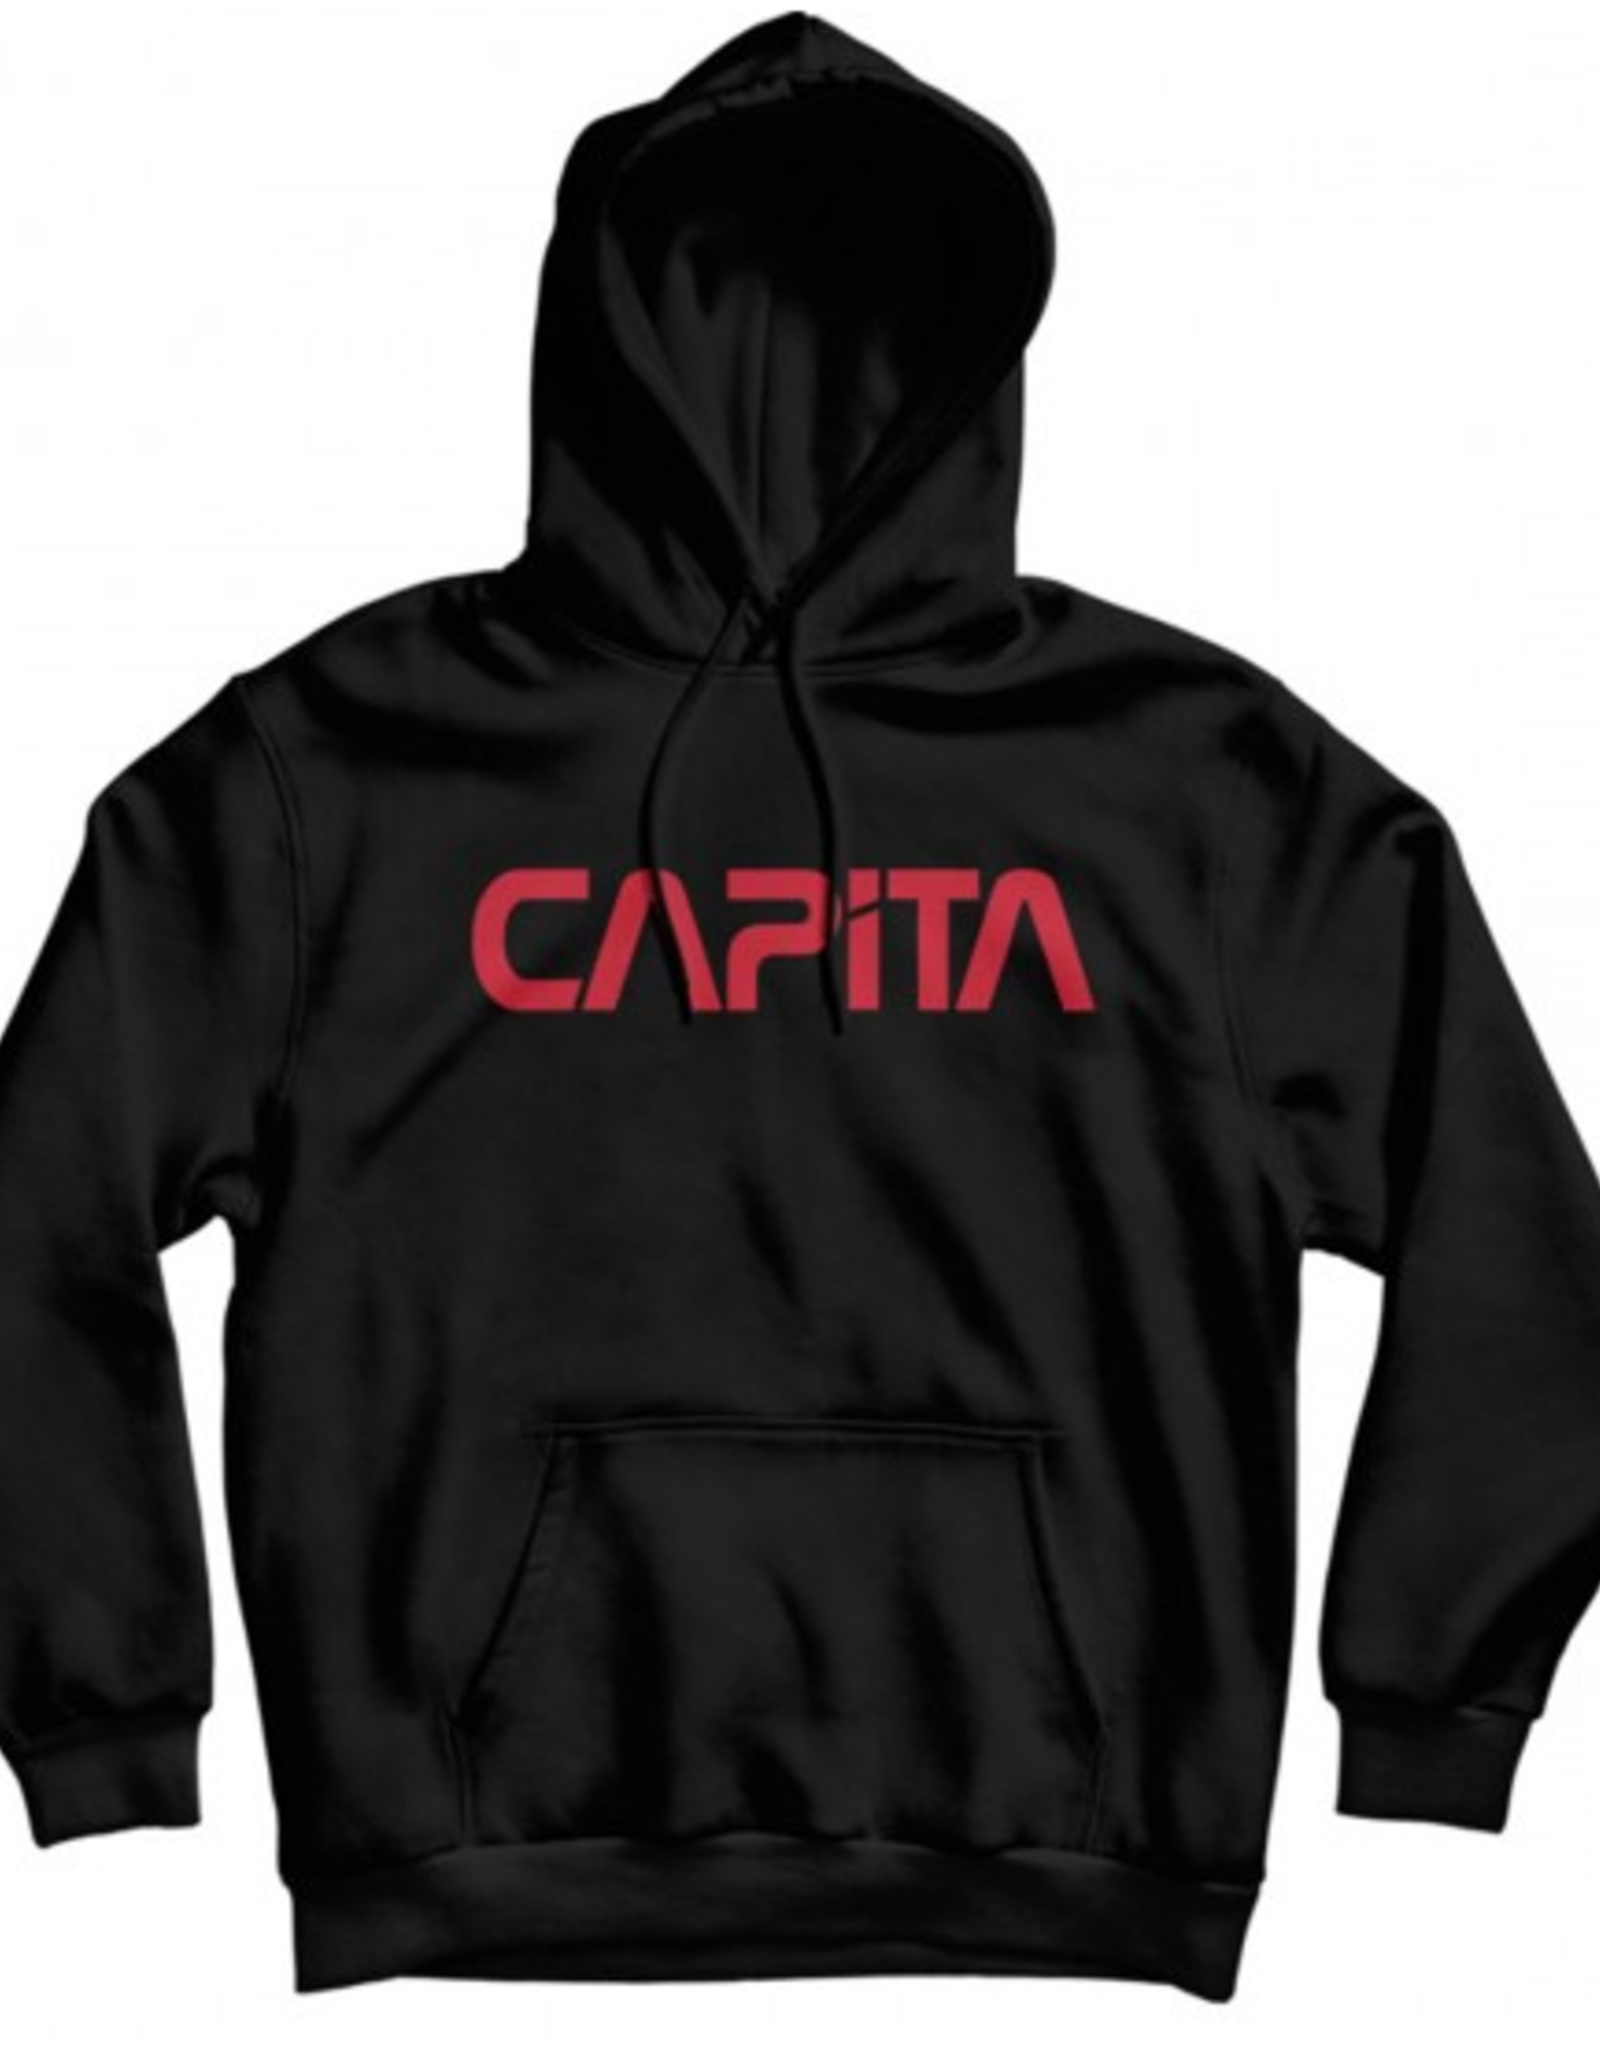 CAPITA CAPITA MARS1 HOODED FLEECE PO HOODIE